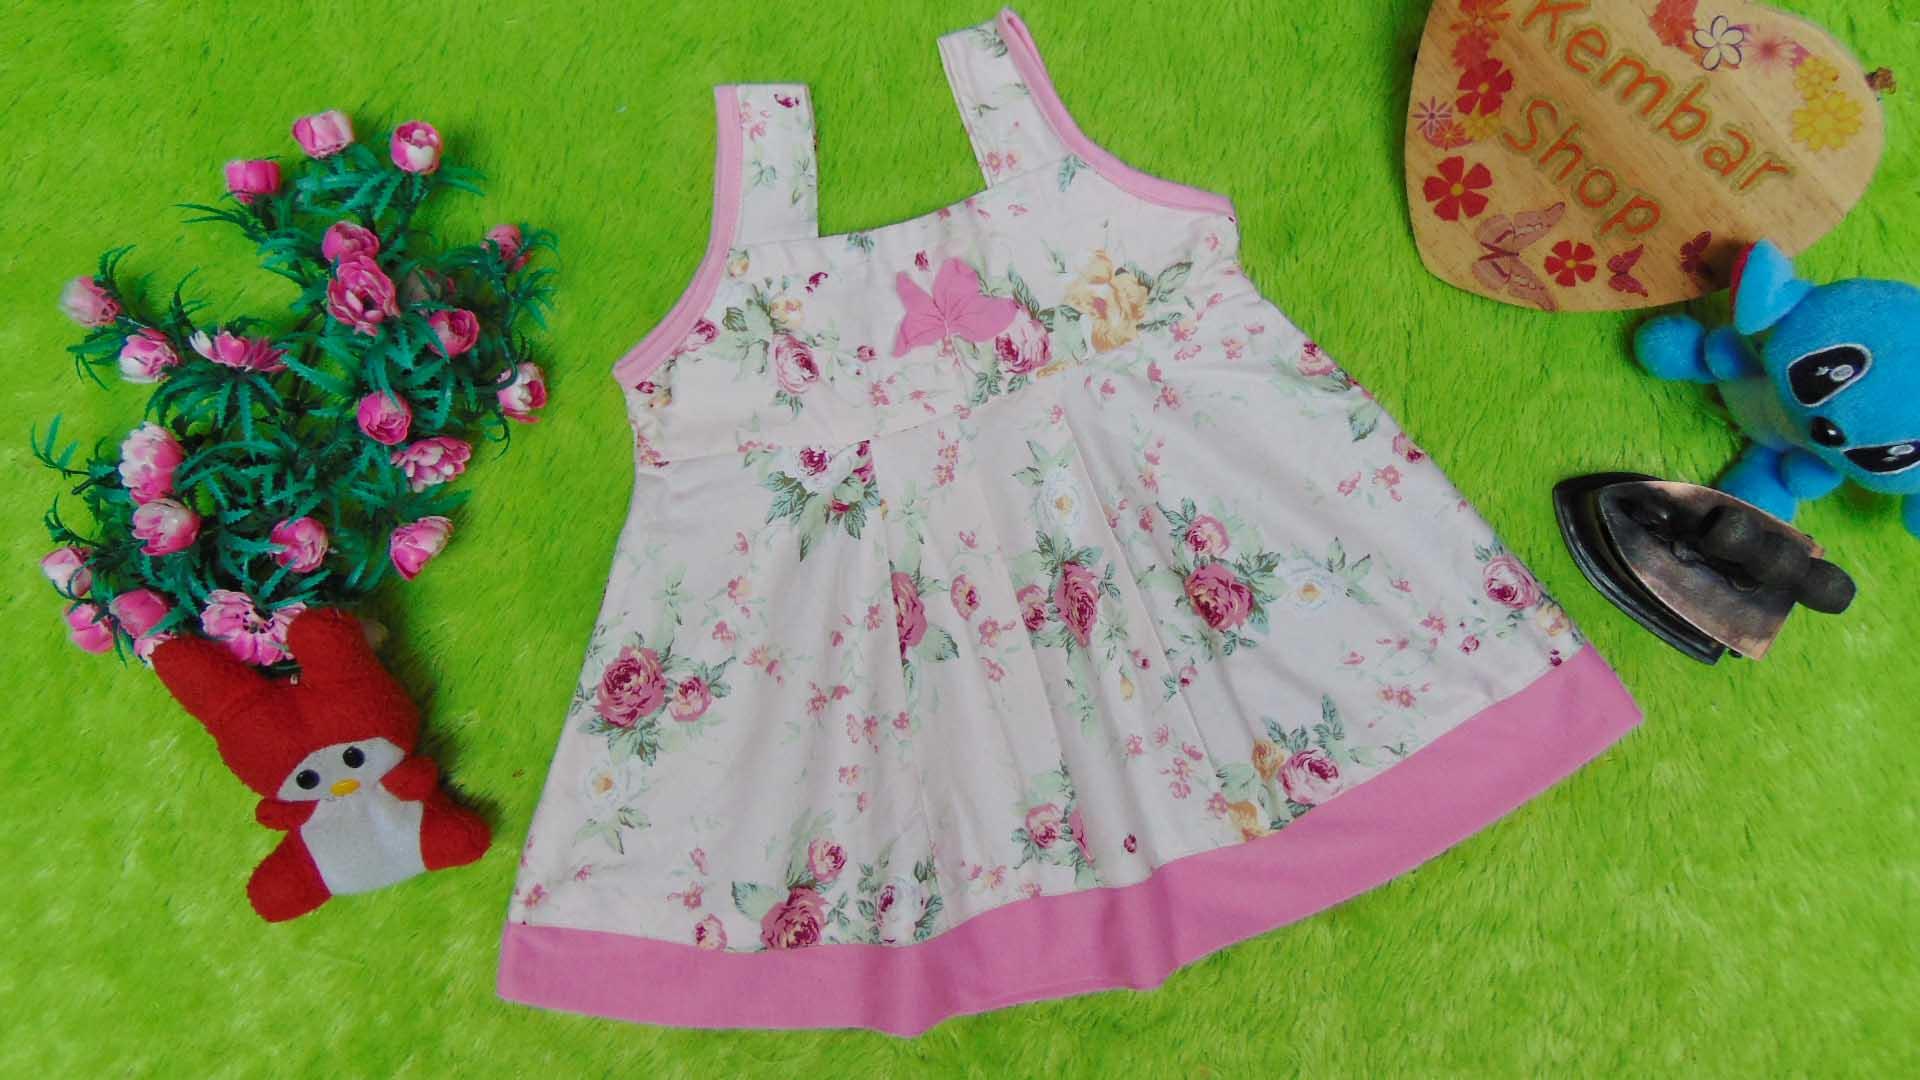 Dress Baju Anak Bayi Cewek Perempuan 0-12bulan Alisa Rose pink, 22 bahan katun adem lembut,bikin dedek tambah cantik, lebar dada 27cm, panjang 41cm